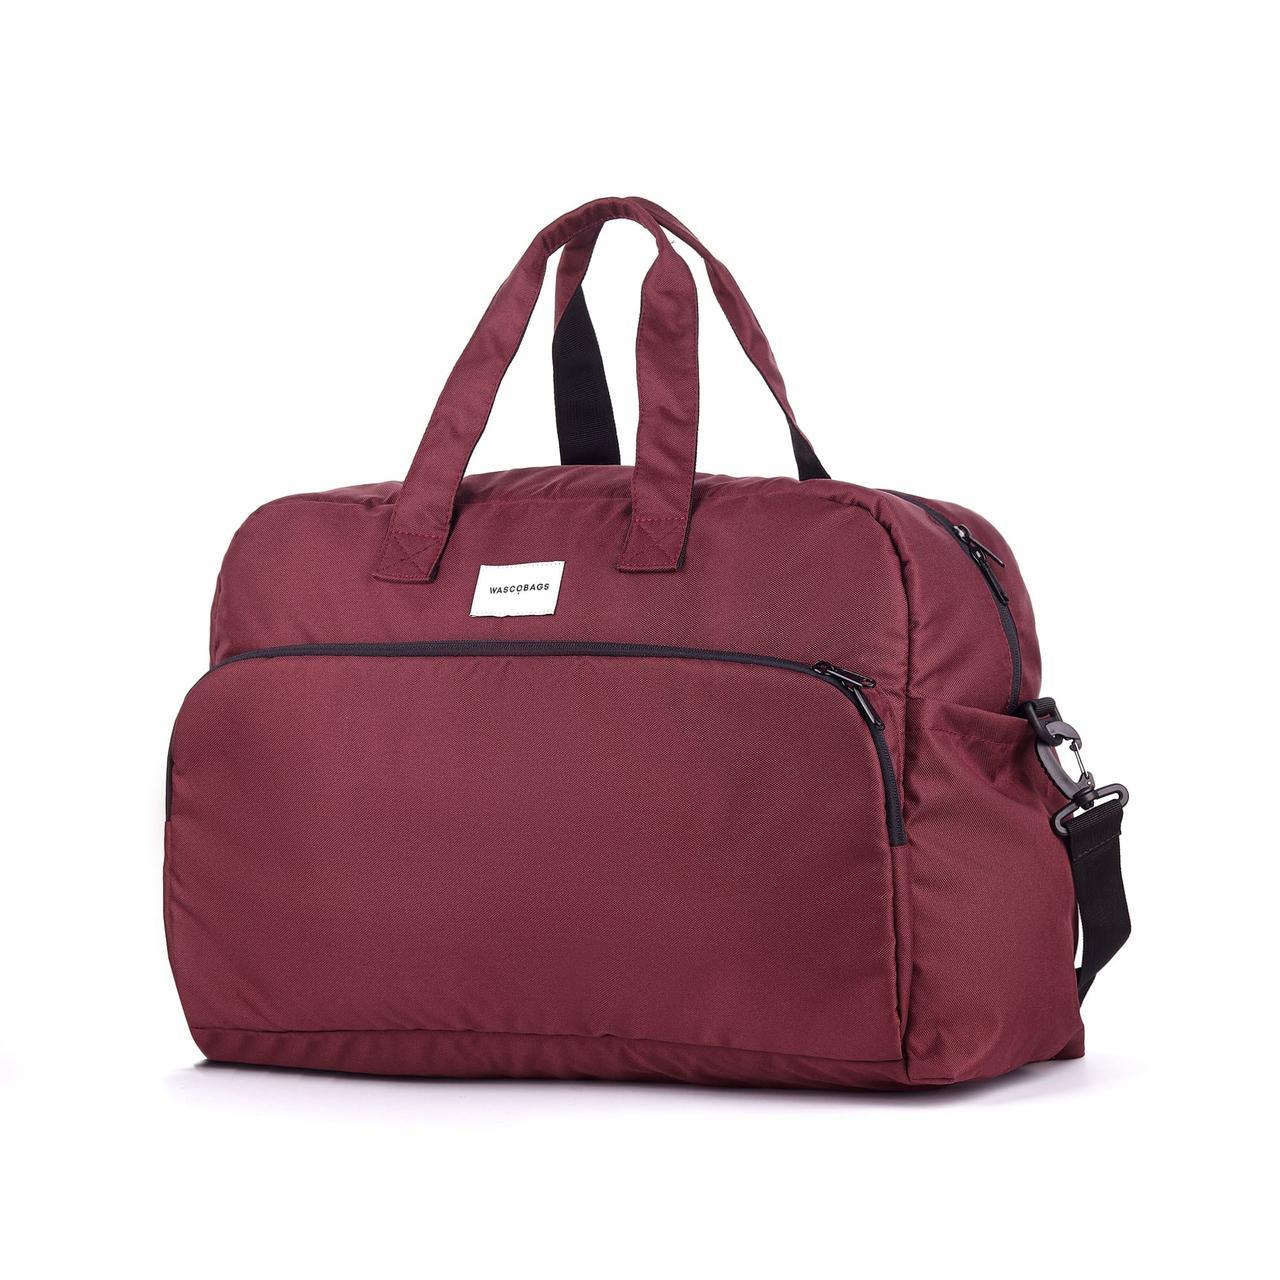 Дорожная сумка Wascobags Milano Бордо (33 L)